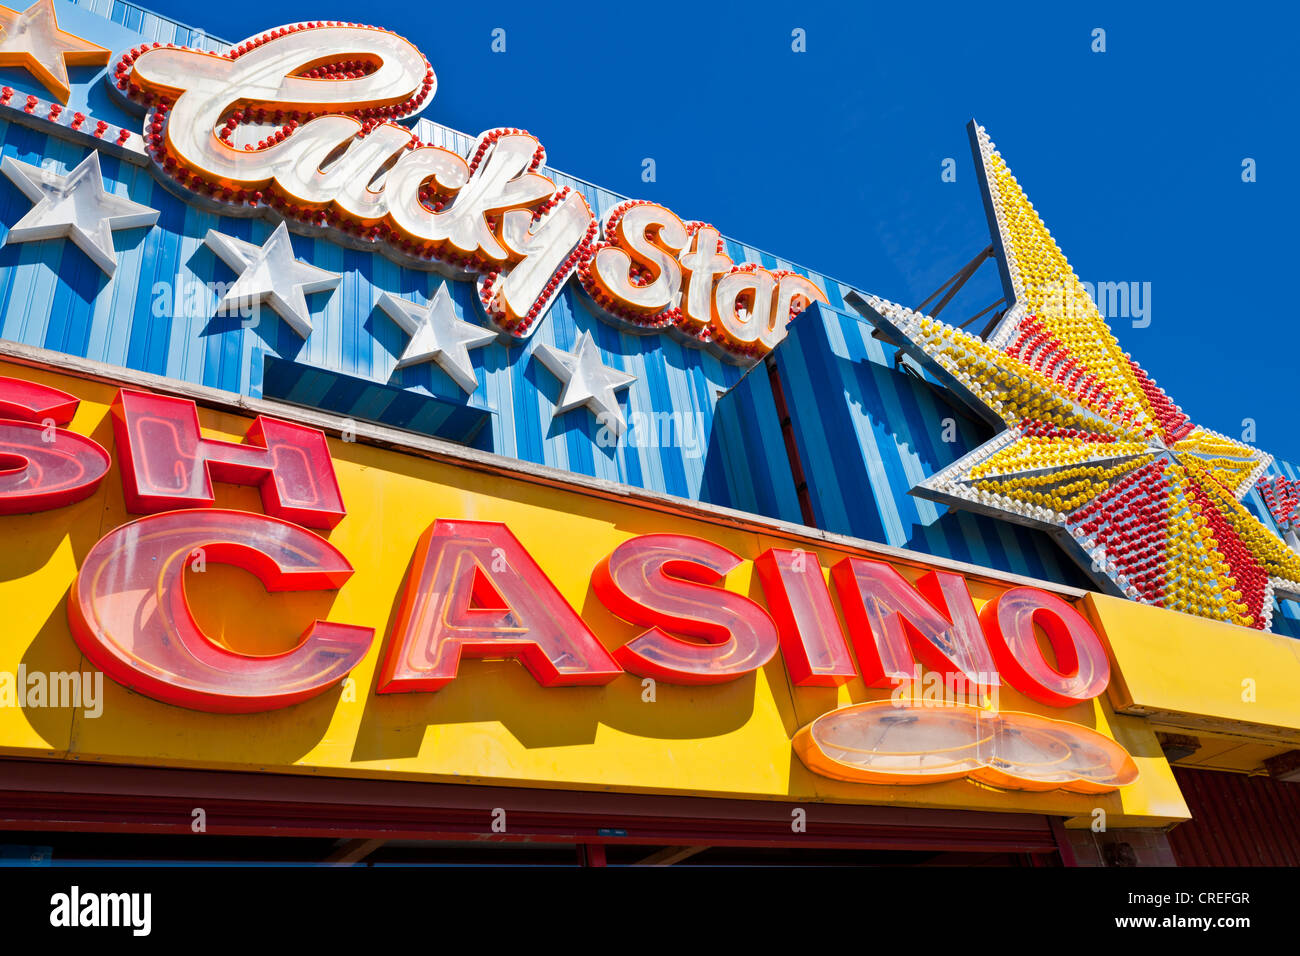 Lucky star casino and amusement arcade sign neon lights Blackpool promenade golden mile Lancashire England UK GB - Stock Image